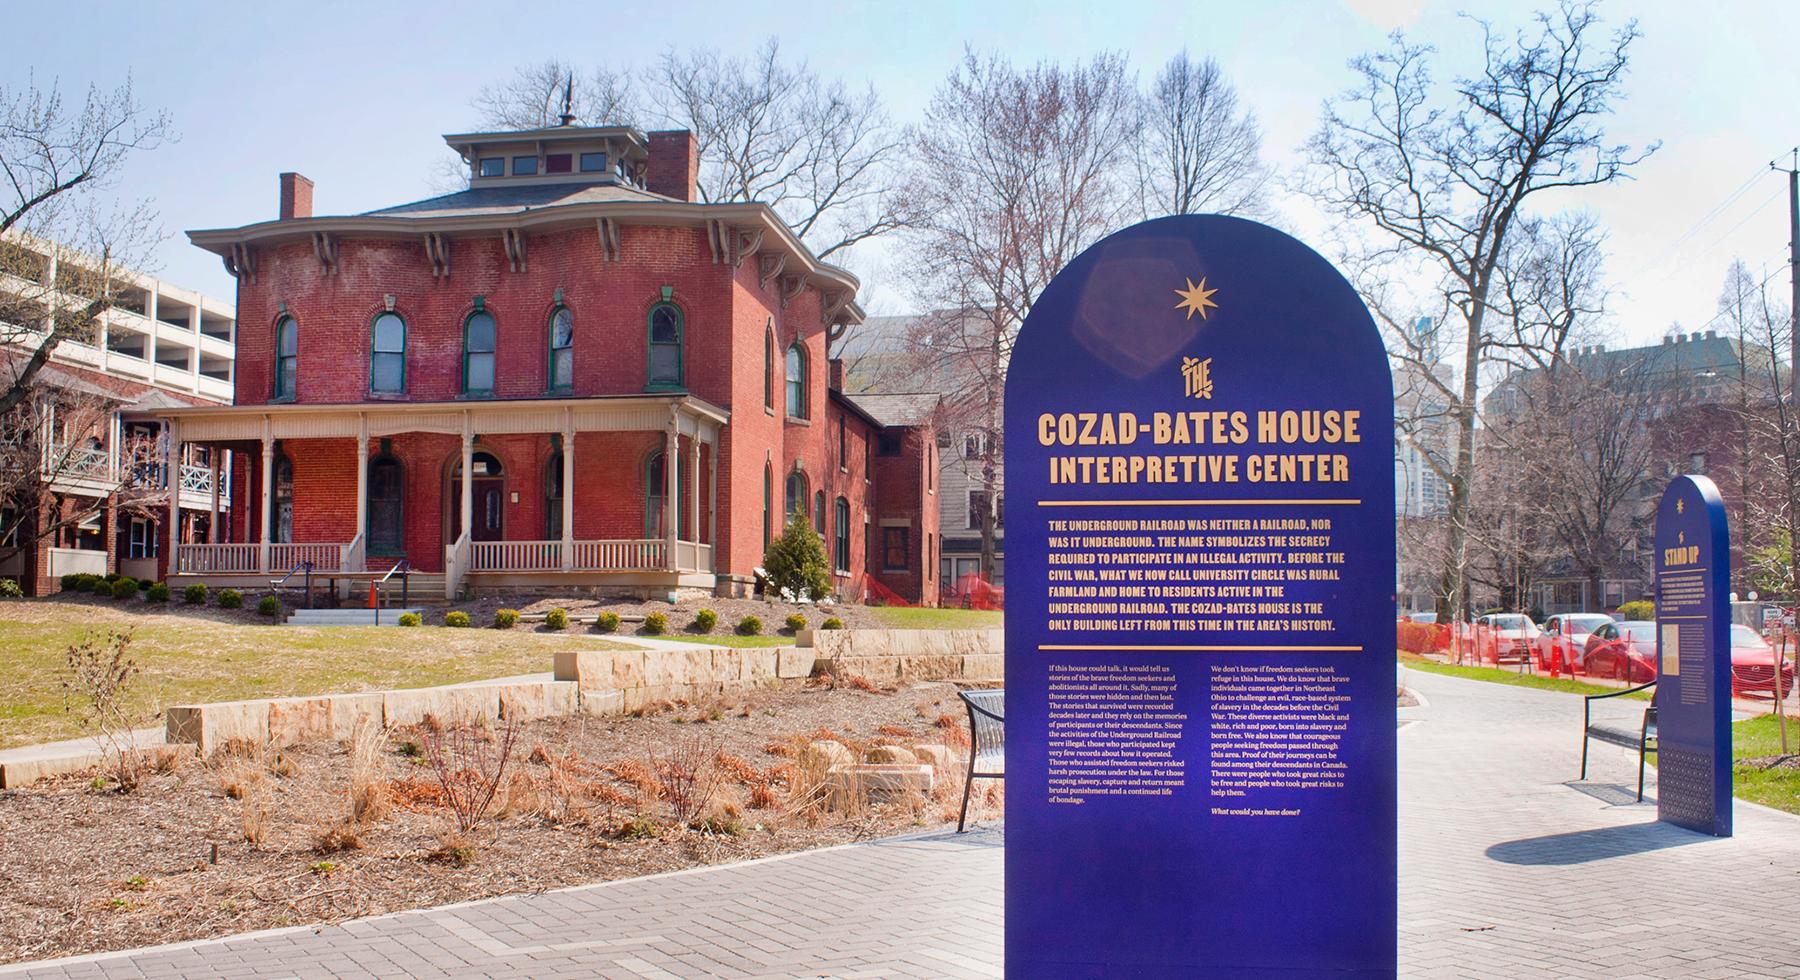 Cozad-Bates Interpretive Center